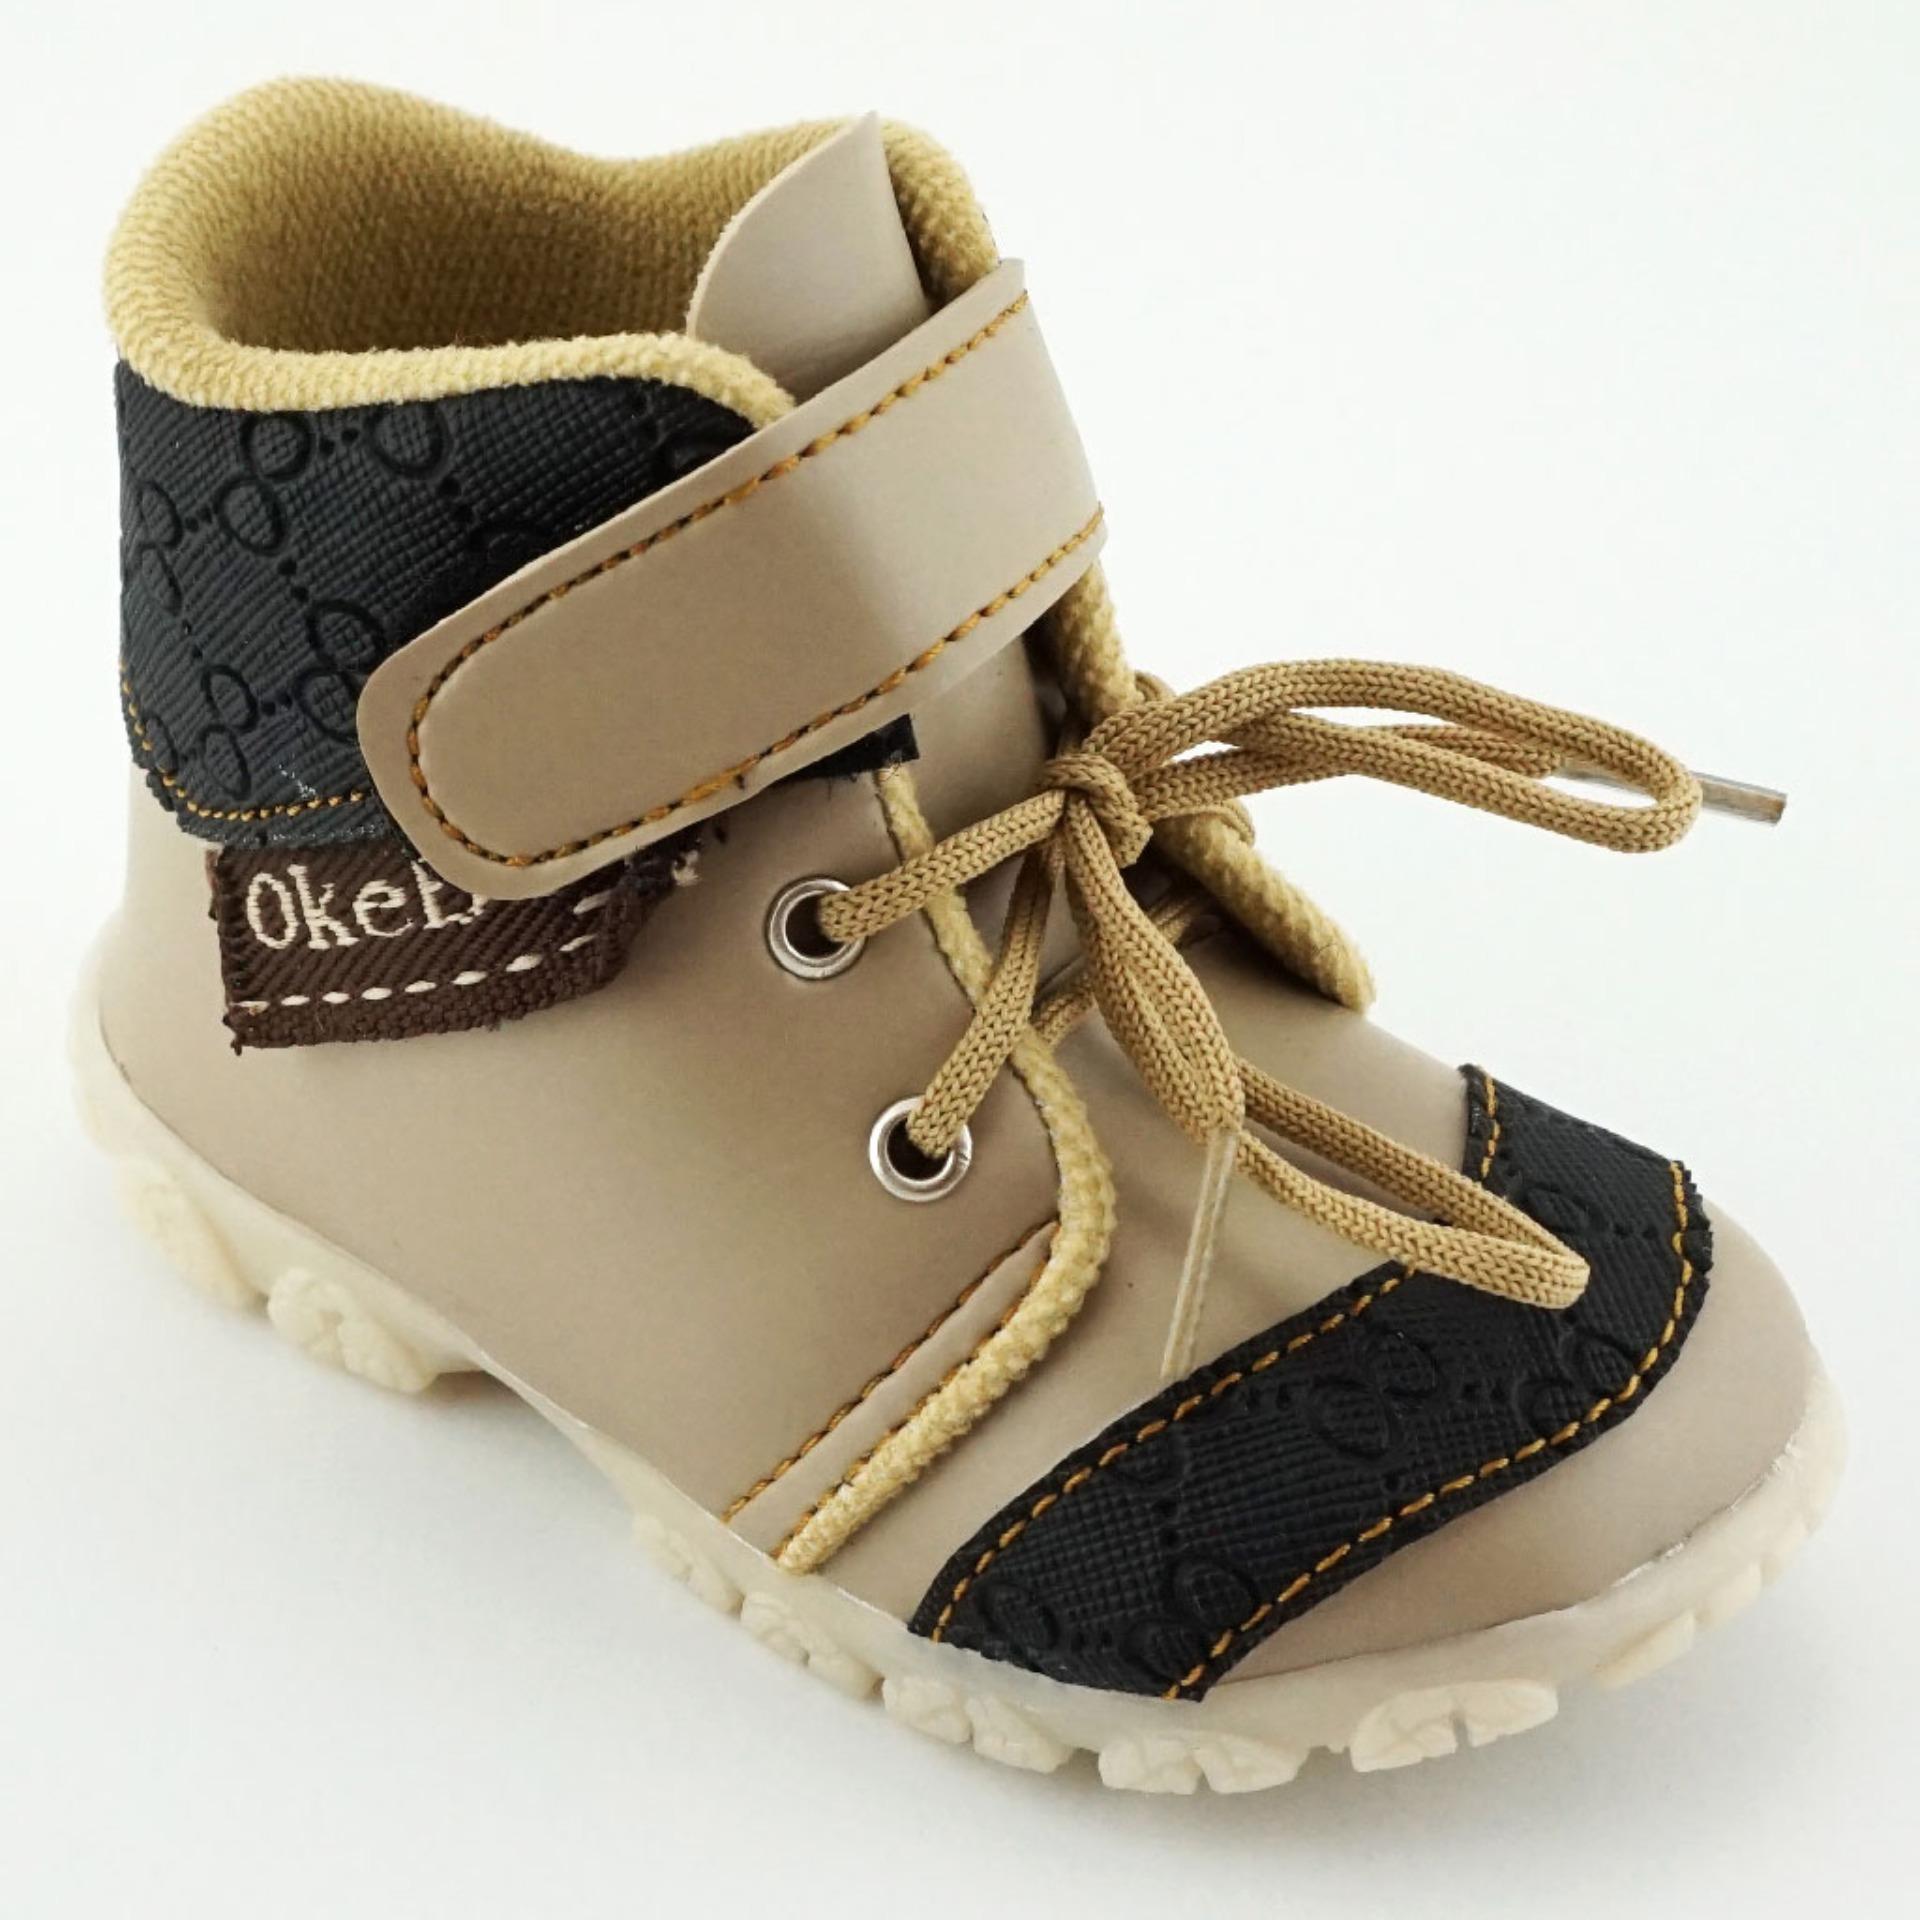 Beli Trendishoes Sepatu Boot Anak Bayi Laki Laki Okeboy Ddokb Beige Terbaru